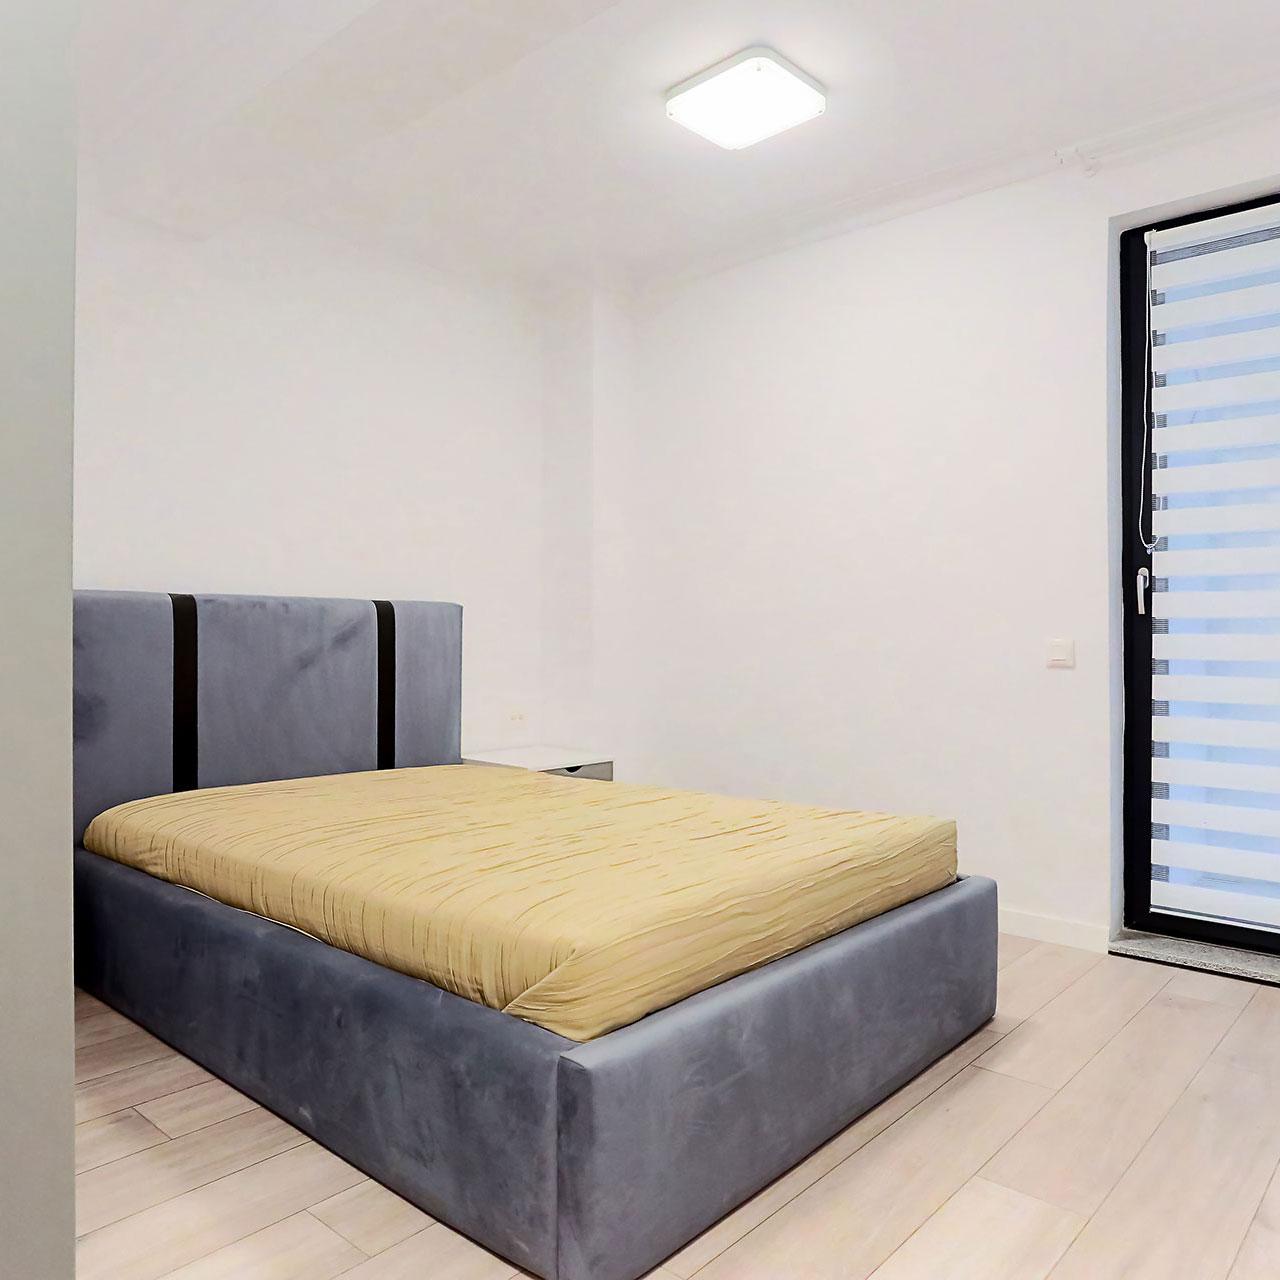 Apartamente cu 2 camere de vanzare Bucuresti - Catedral Residence - Marriott, Piata Unirii, 13 Septembrie, Izvor - G0 - 11